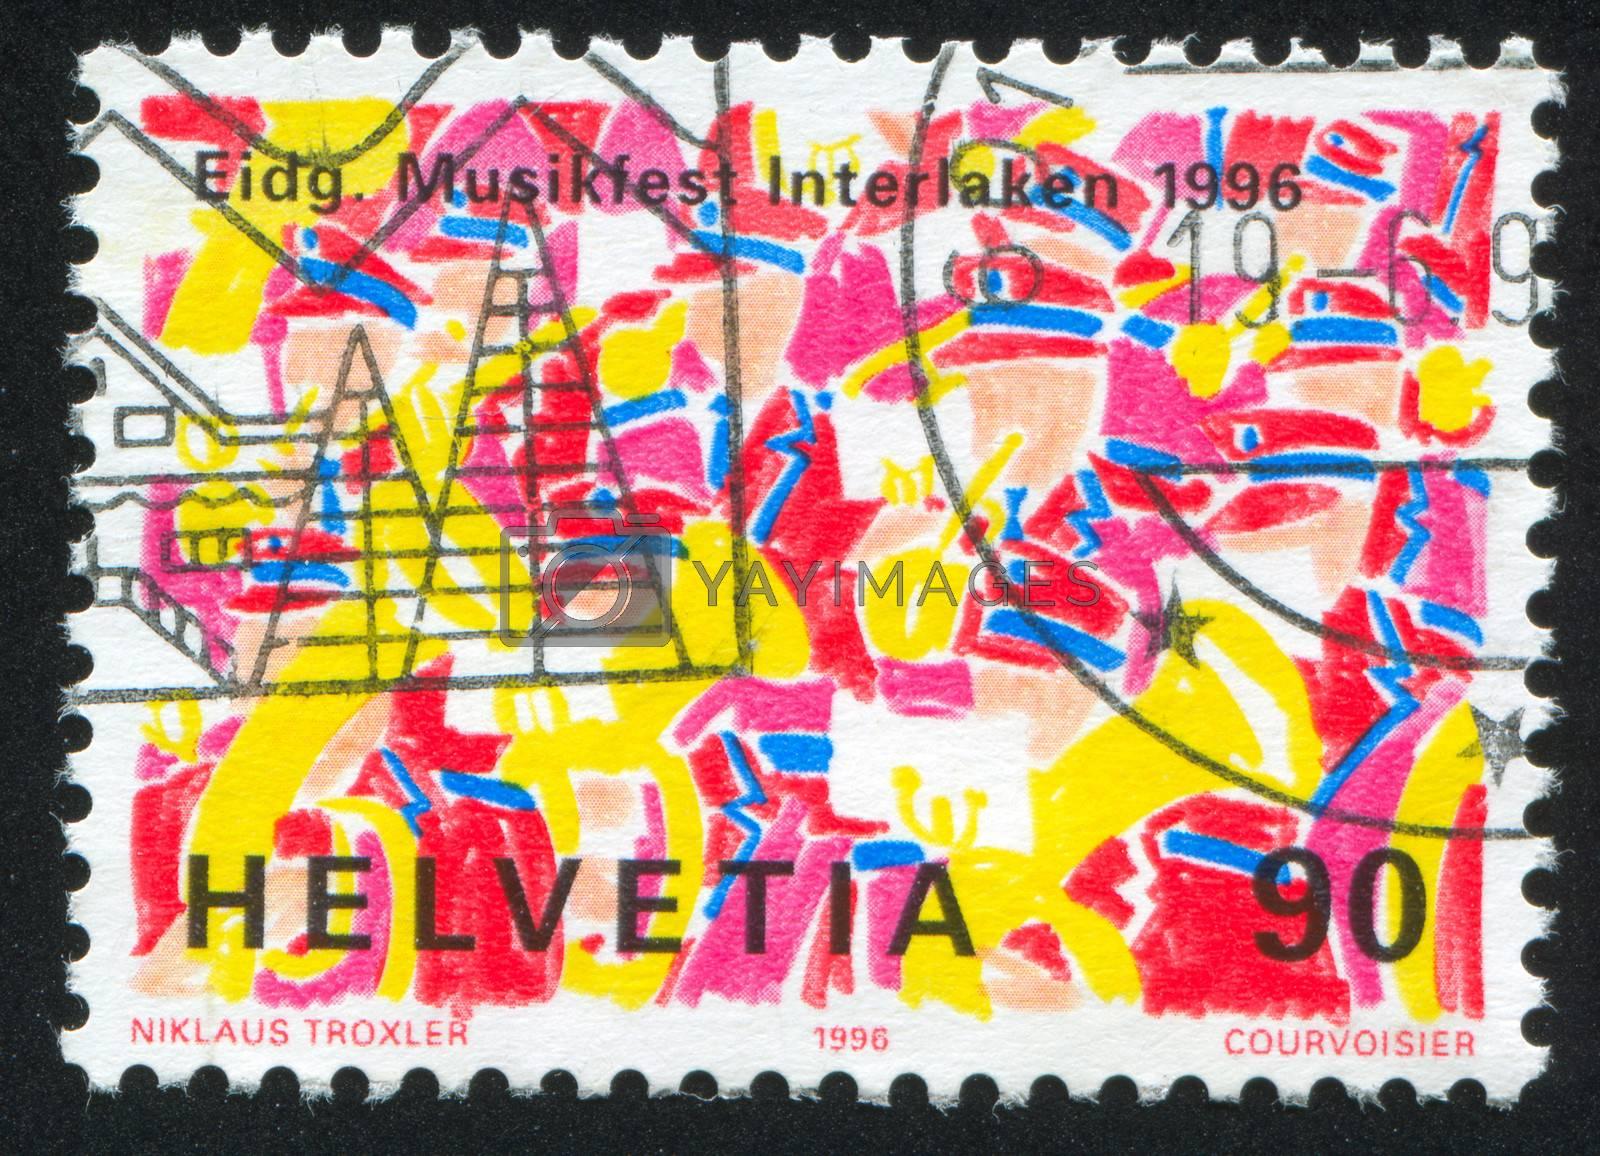 SWITZERLAND - CIRCA 1996: stamp printed by Switzerland, shows Music Festival, circa 1996